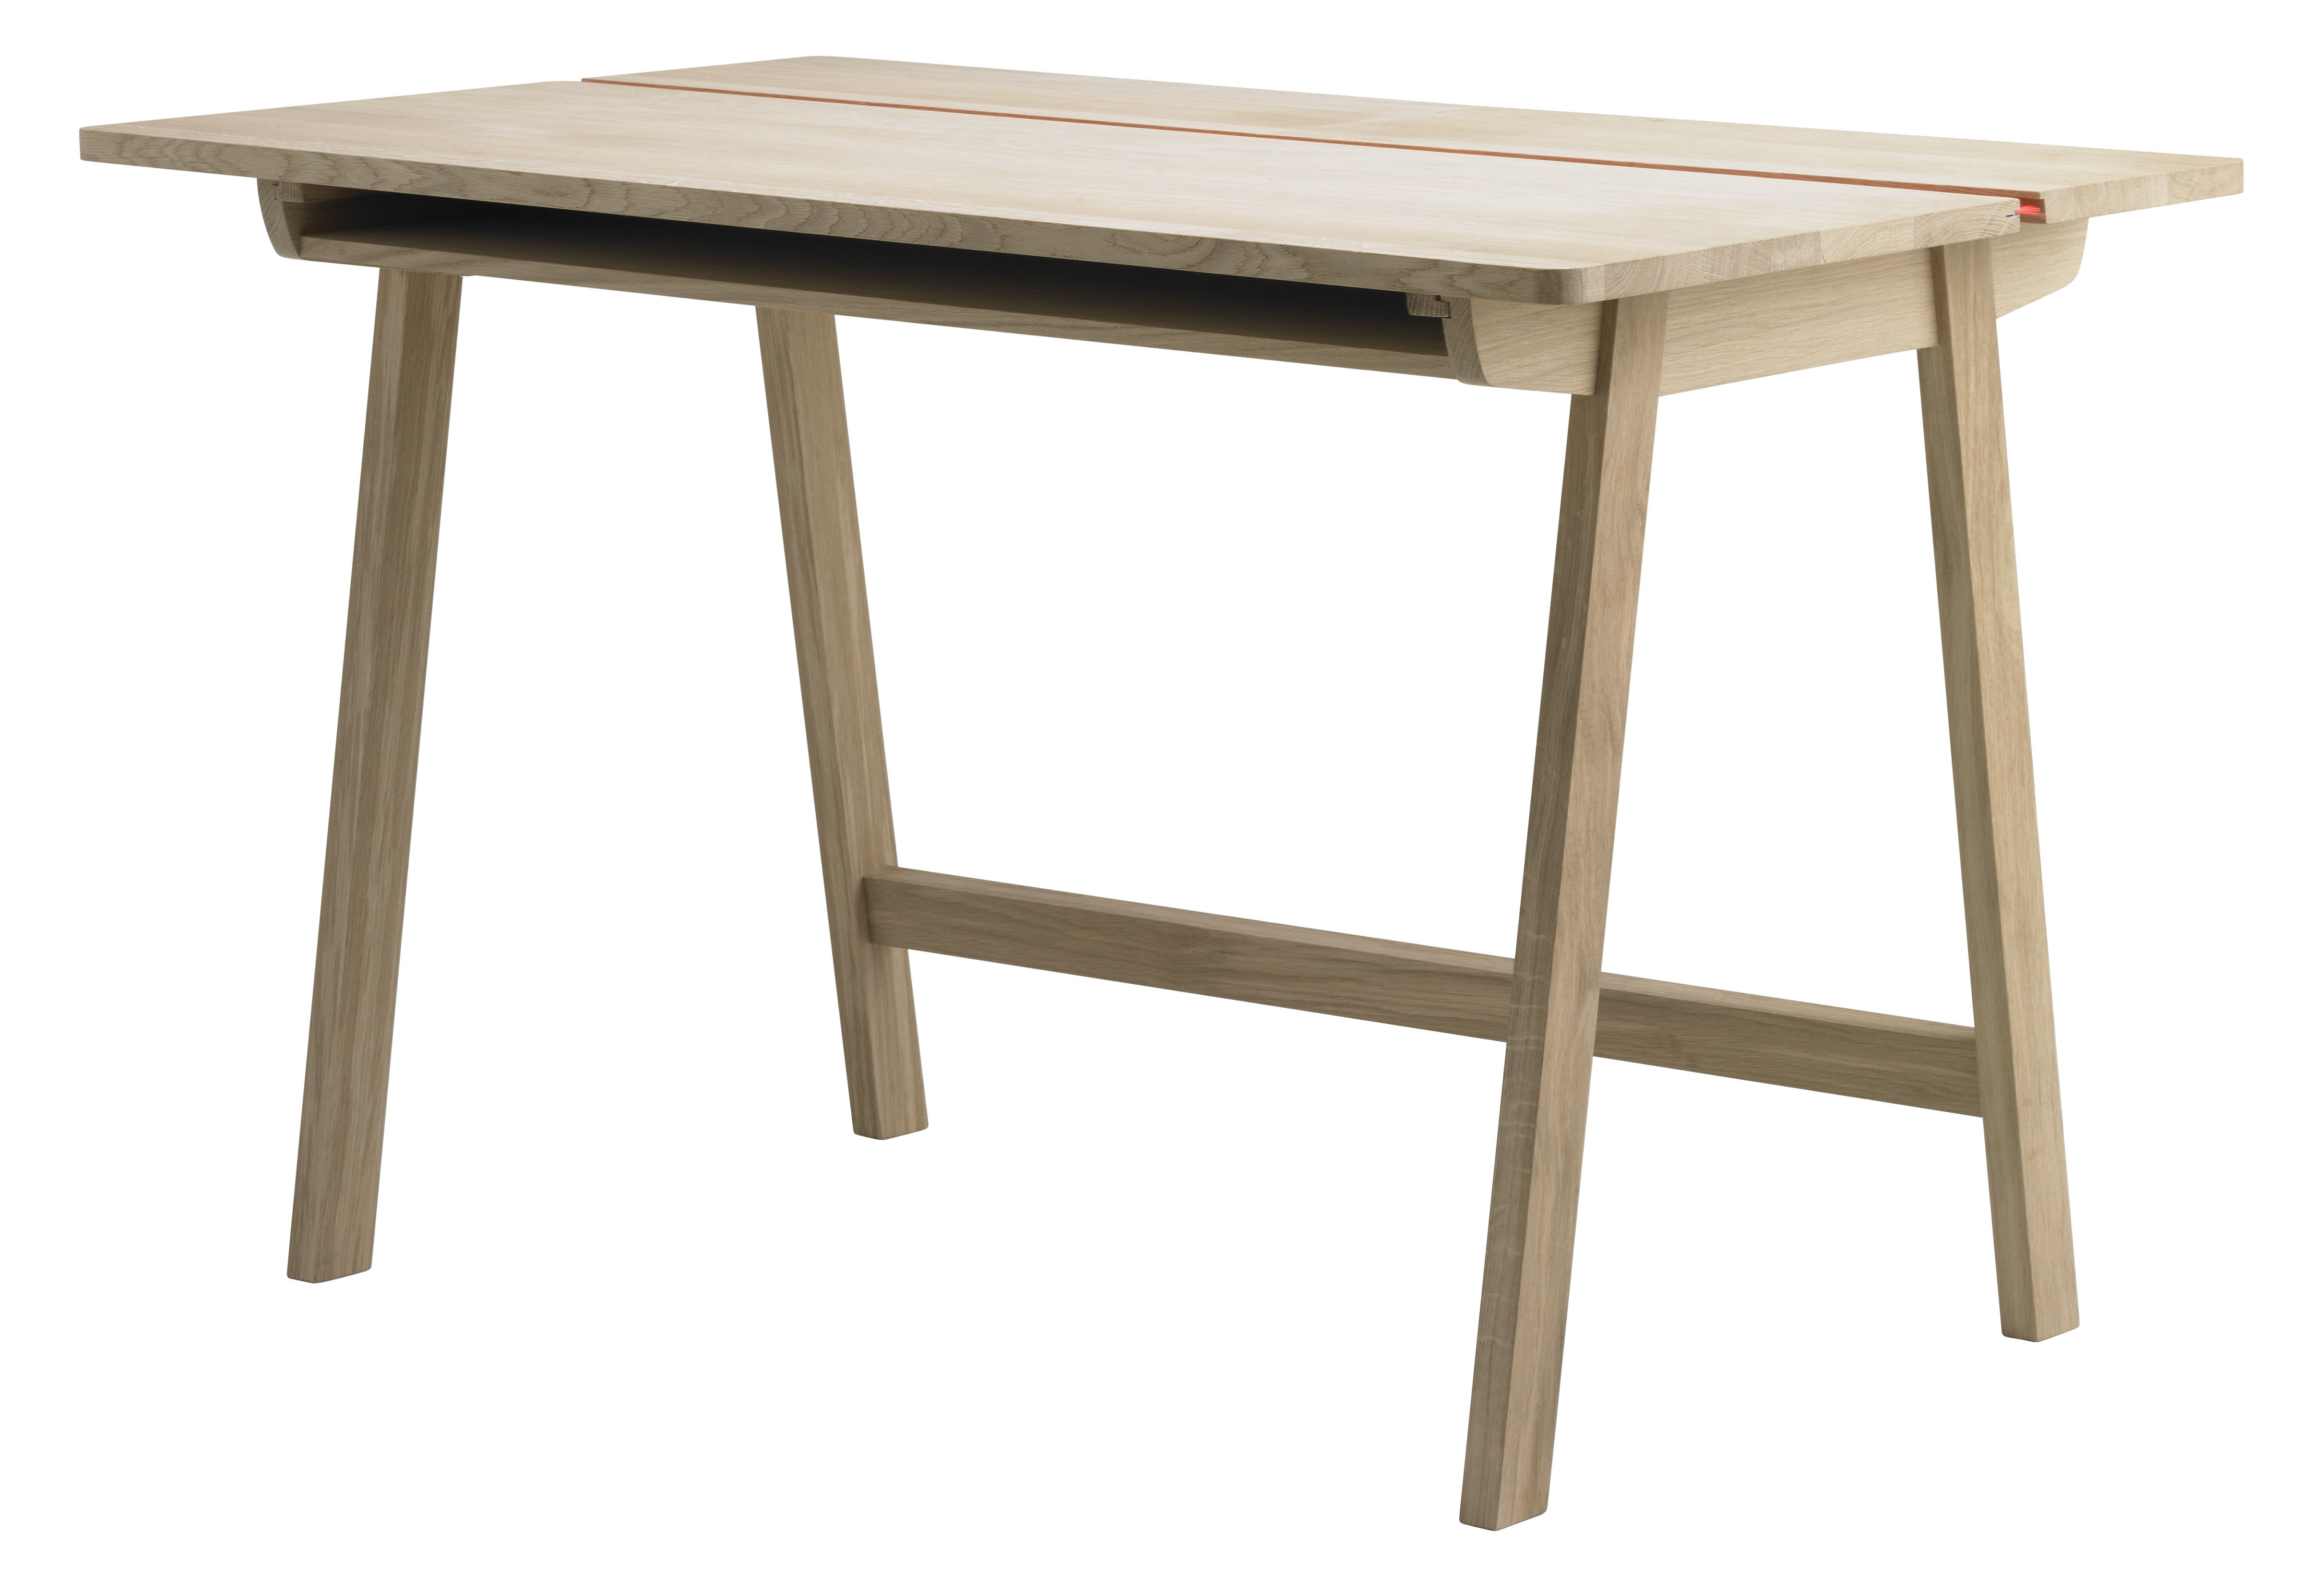 Mobilier - Mobilier Ados - Bureau Landa / L 120 cm - Alki - 120 x 70,5 cm - Chêne naturel - Chêne, Multiplis plaqué chêne